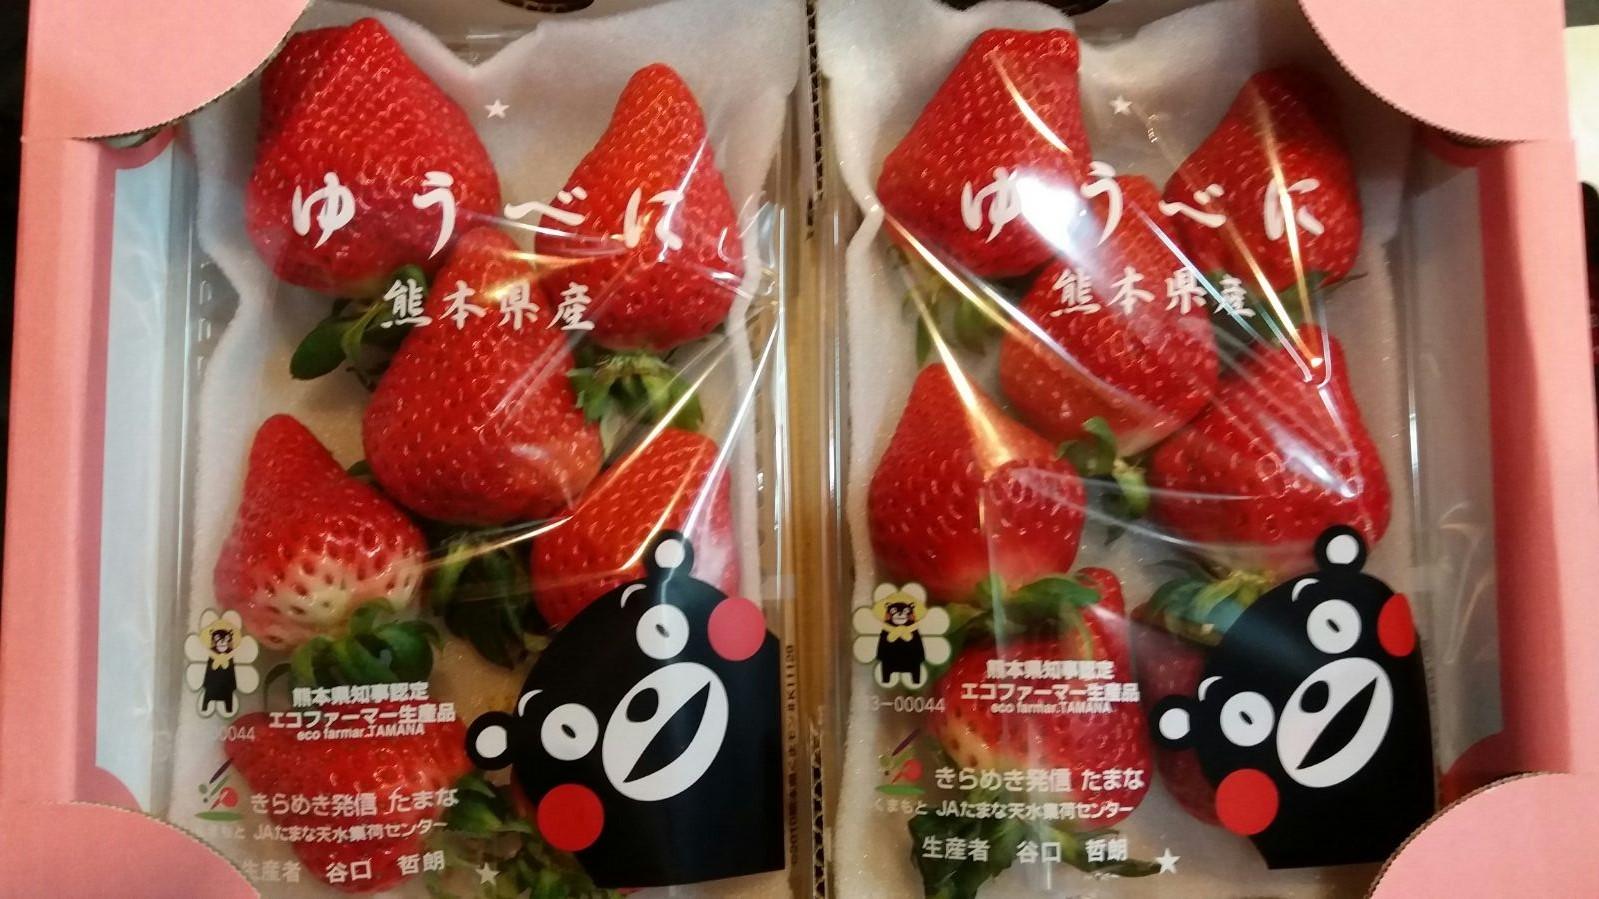 Fukuoka Amaou Strawberry